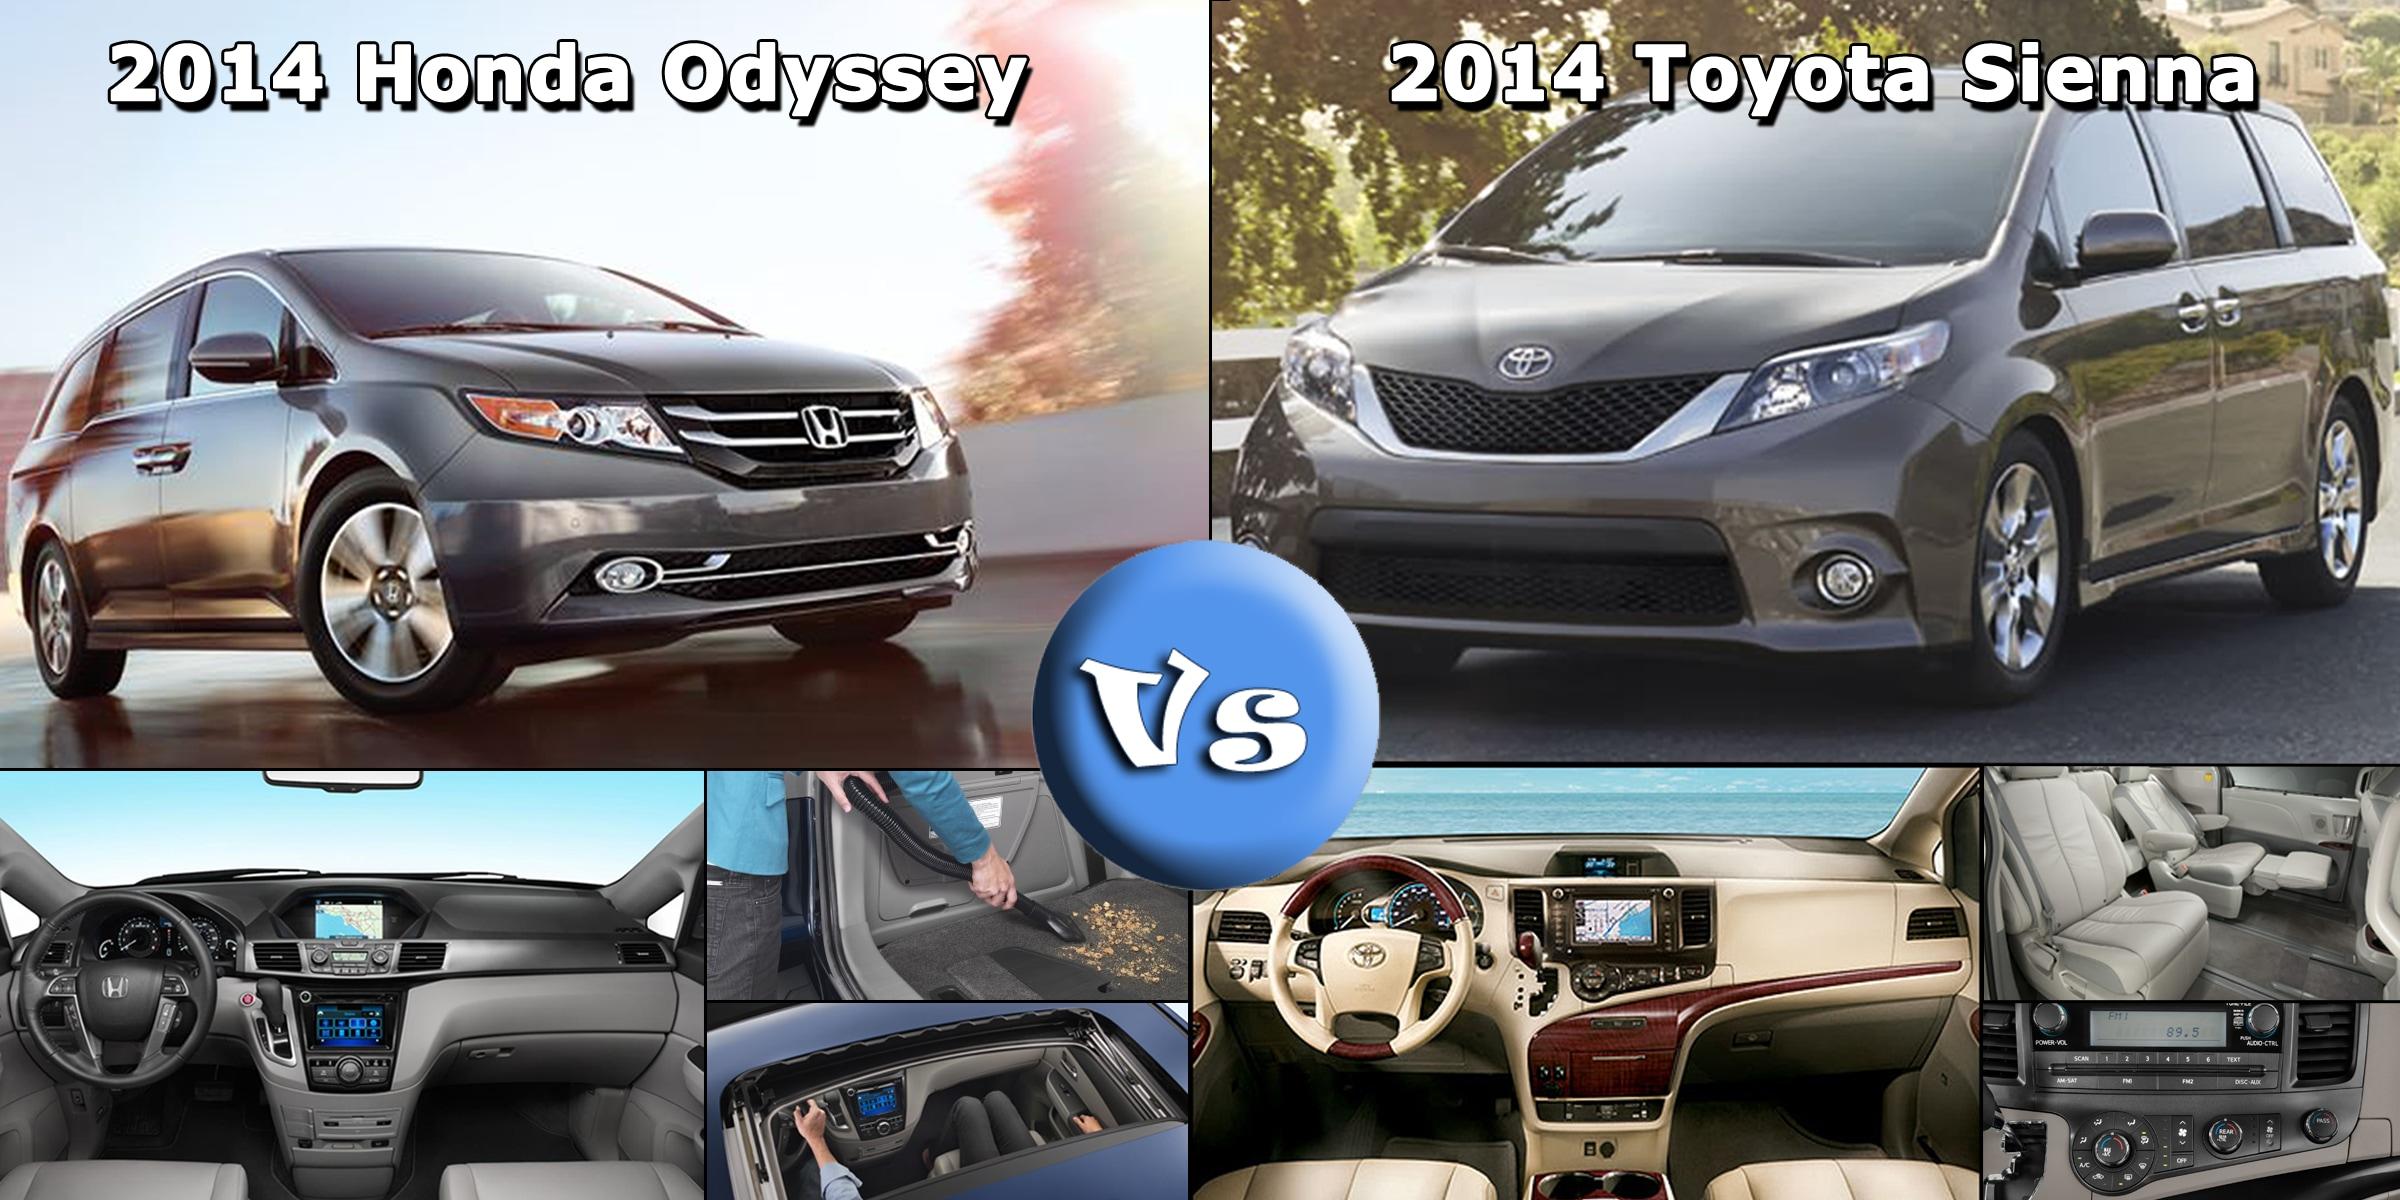 Minivan Comparison 2014 Honda Odyssey Vs 2014 Toyota Sienna